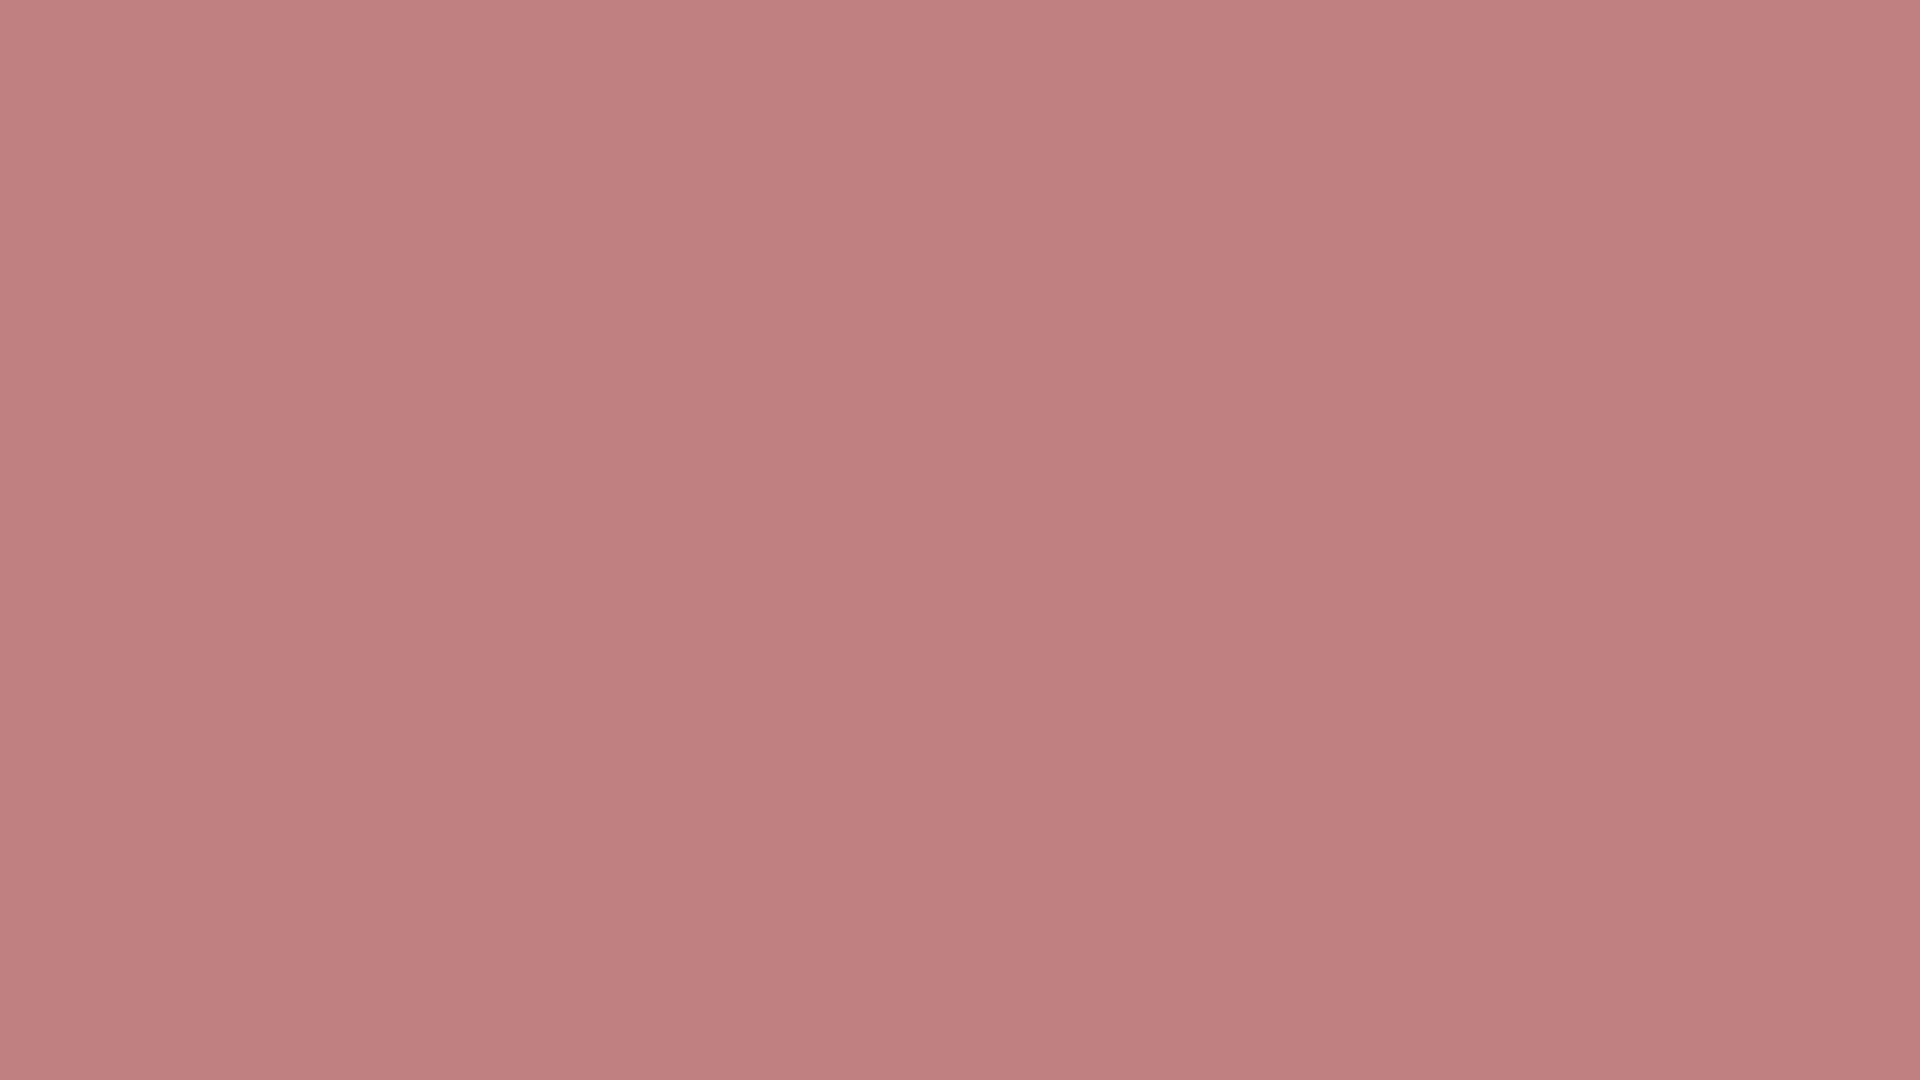 1920x1080 Old Rose Solid Color Background